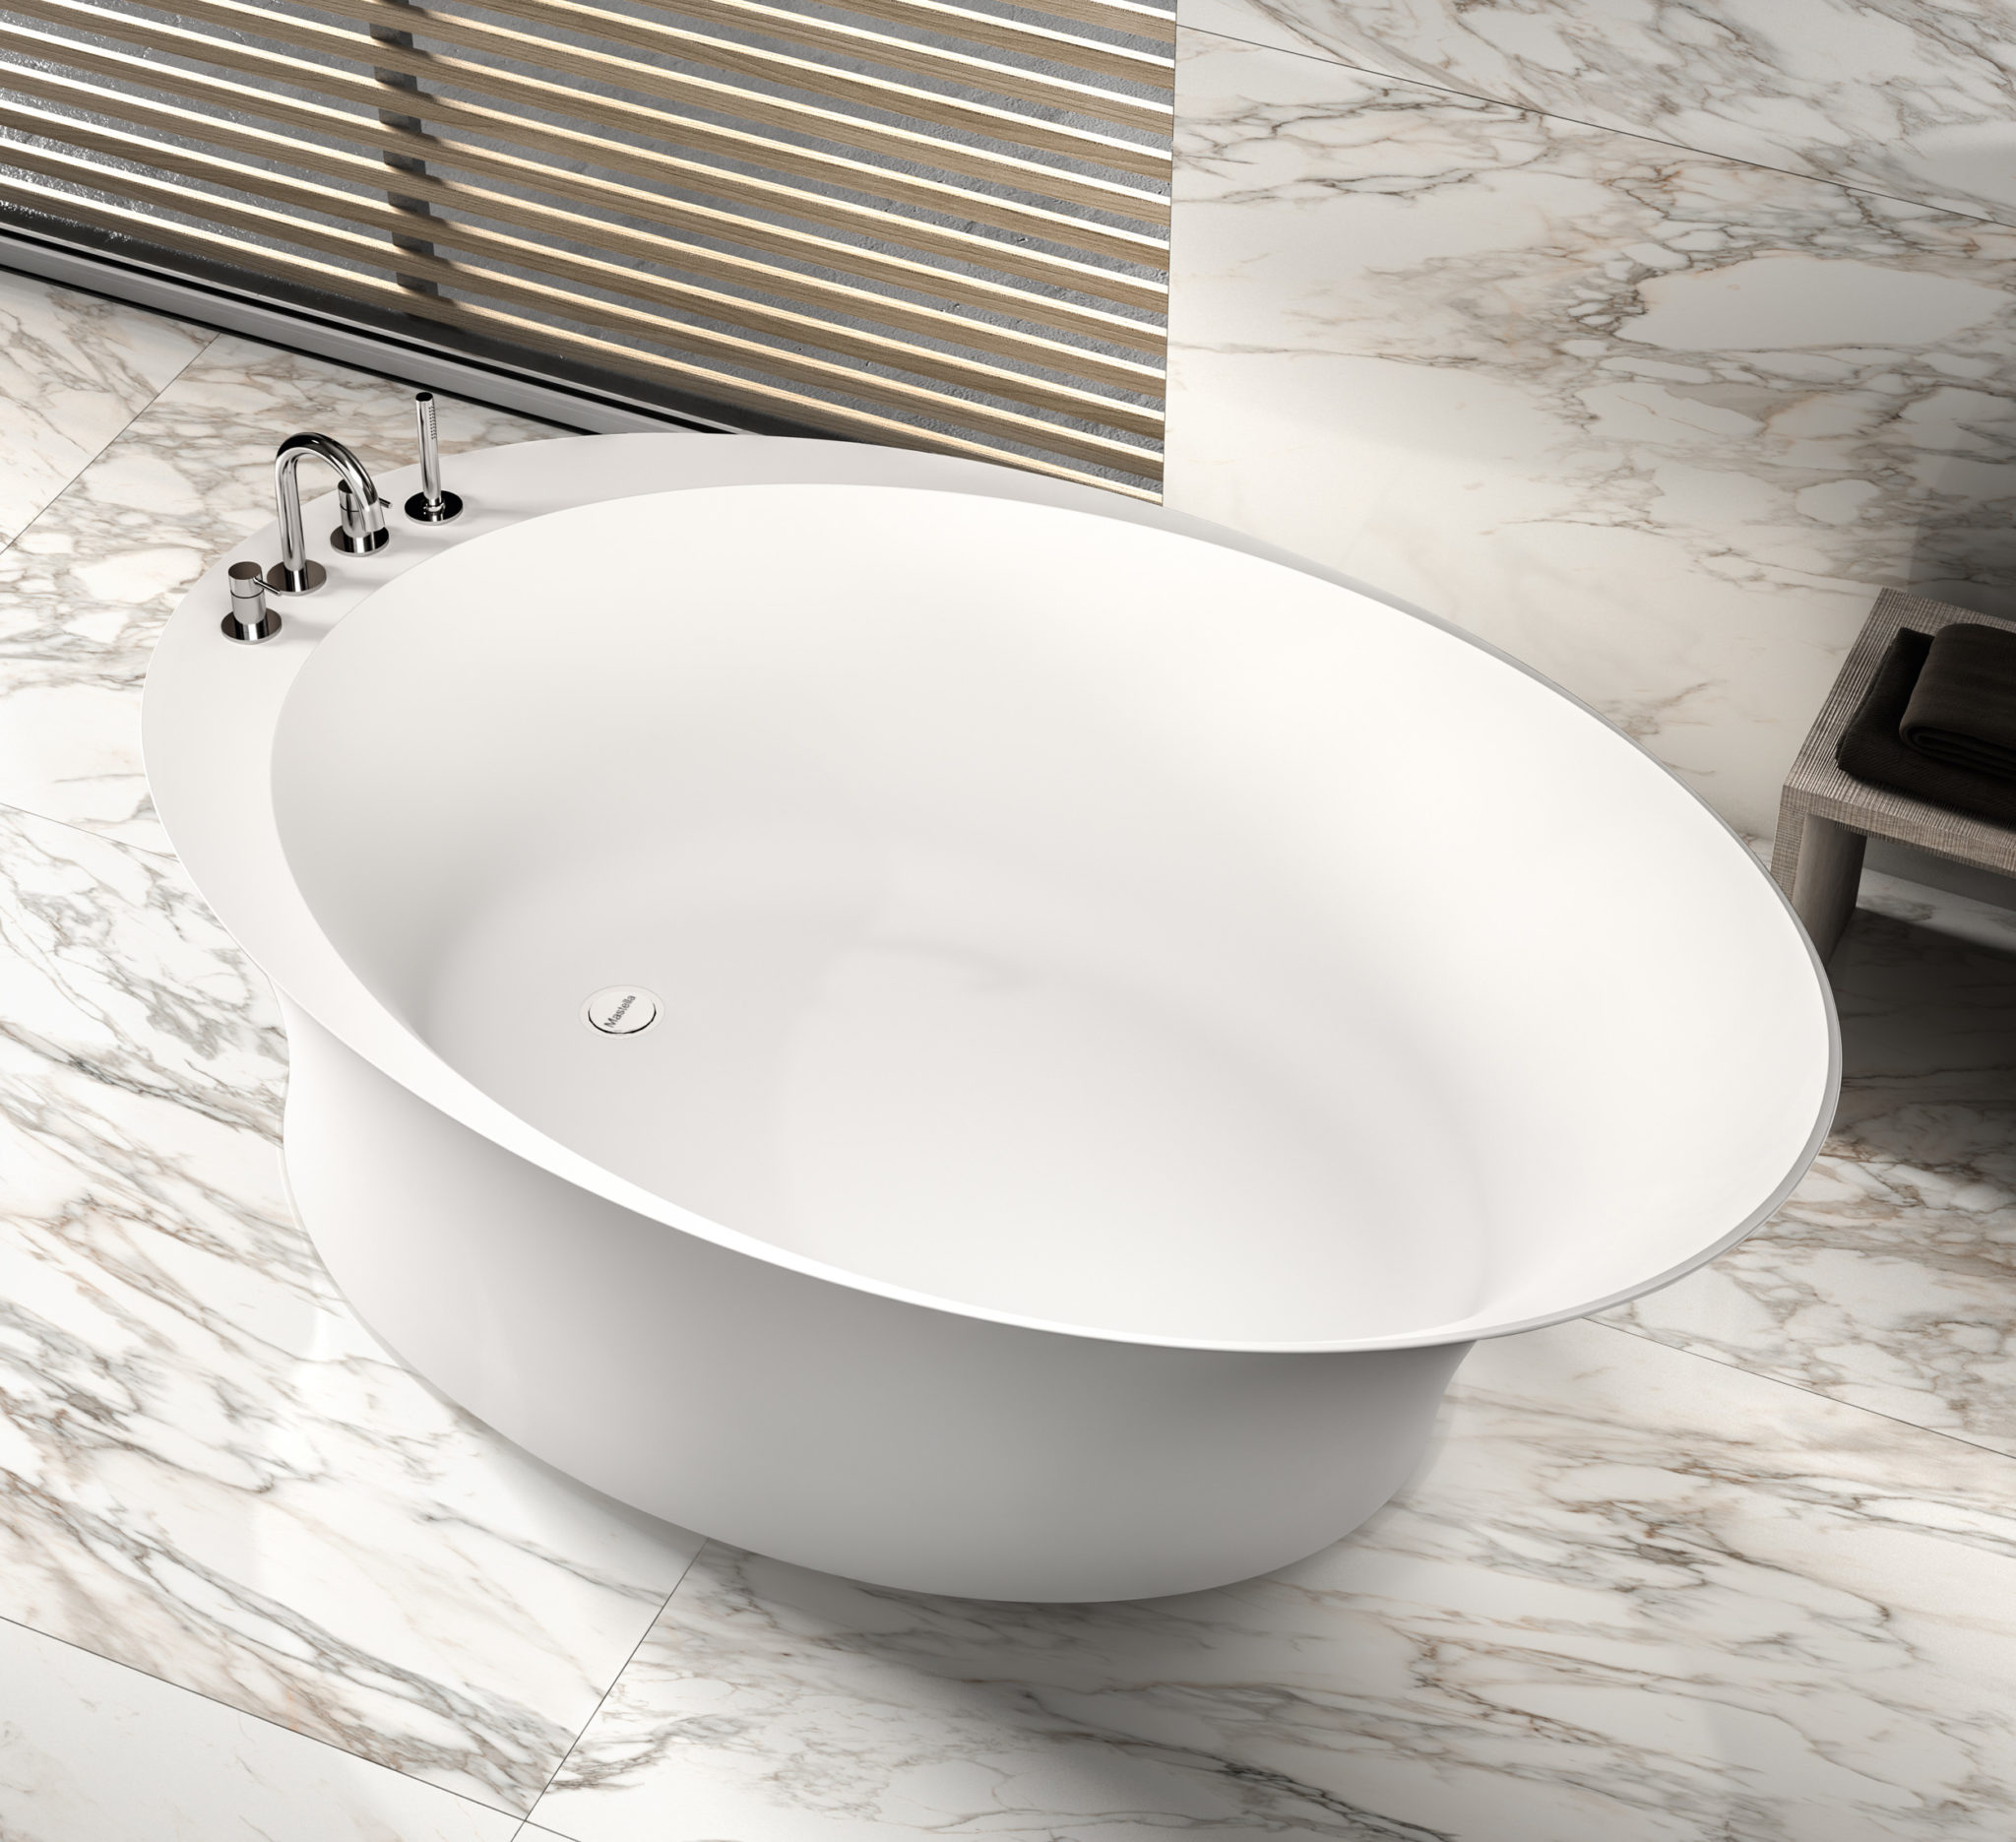 Bathroom furniture,bathroom cabinets - 21014 Mastella Vasca Helen v1 var